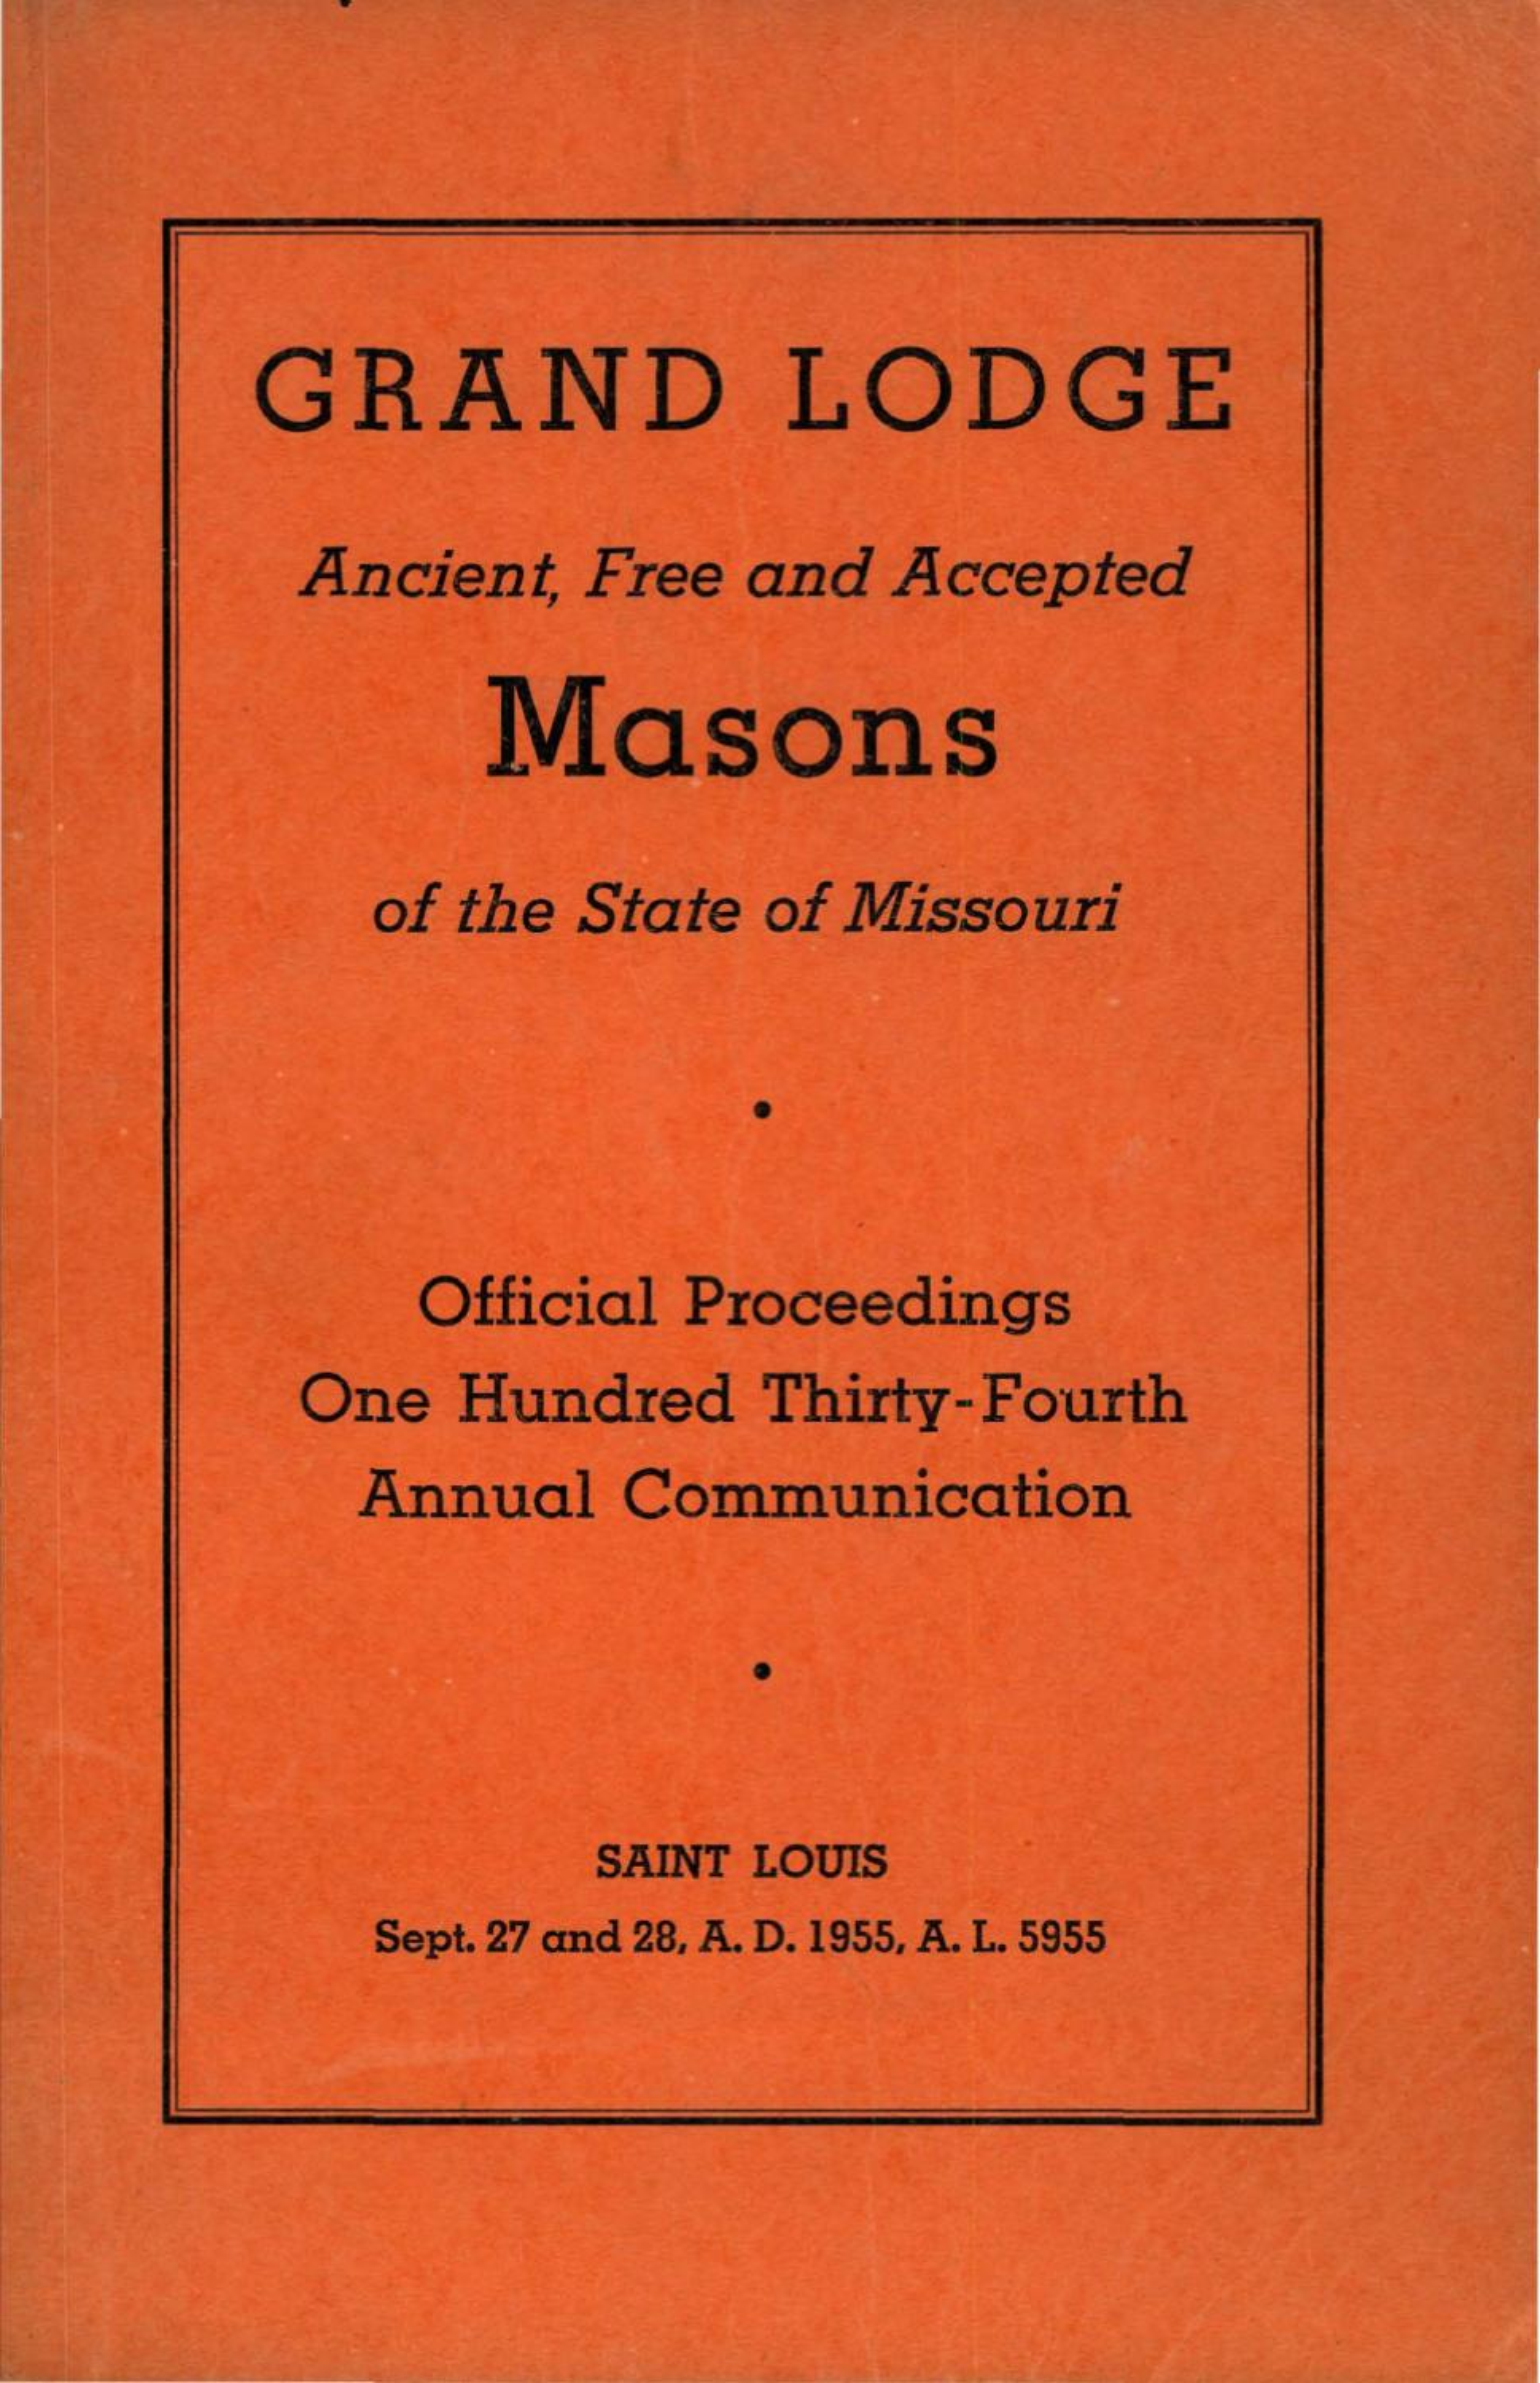 1955 Proceedings - Grand Lodge of Missouri by Missouri